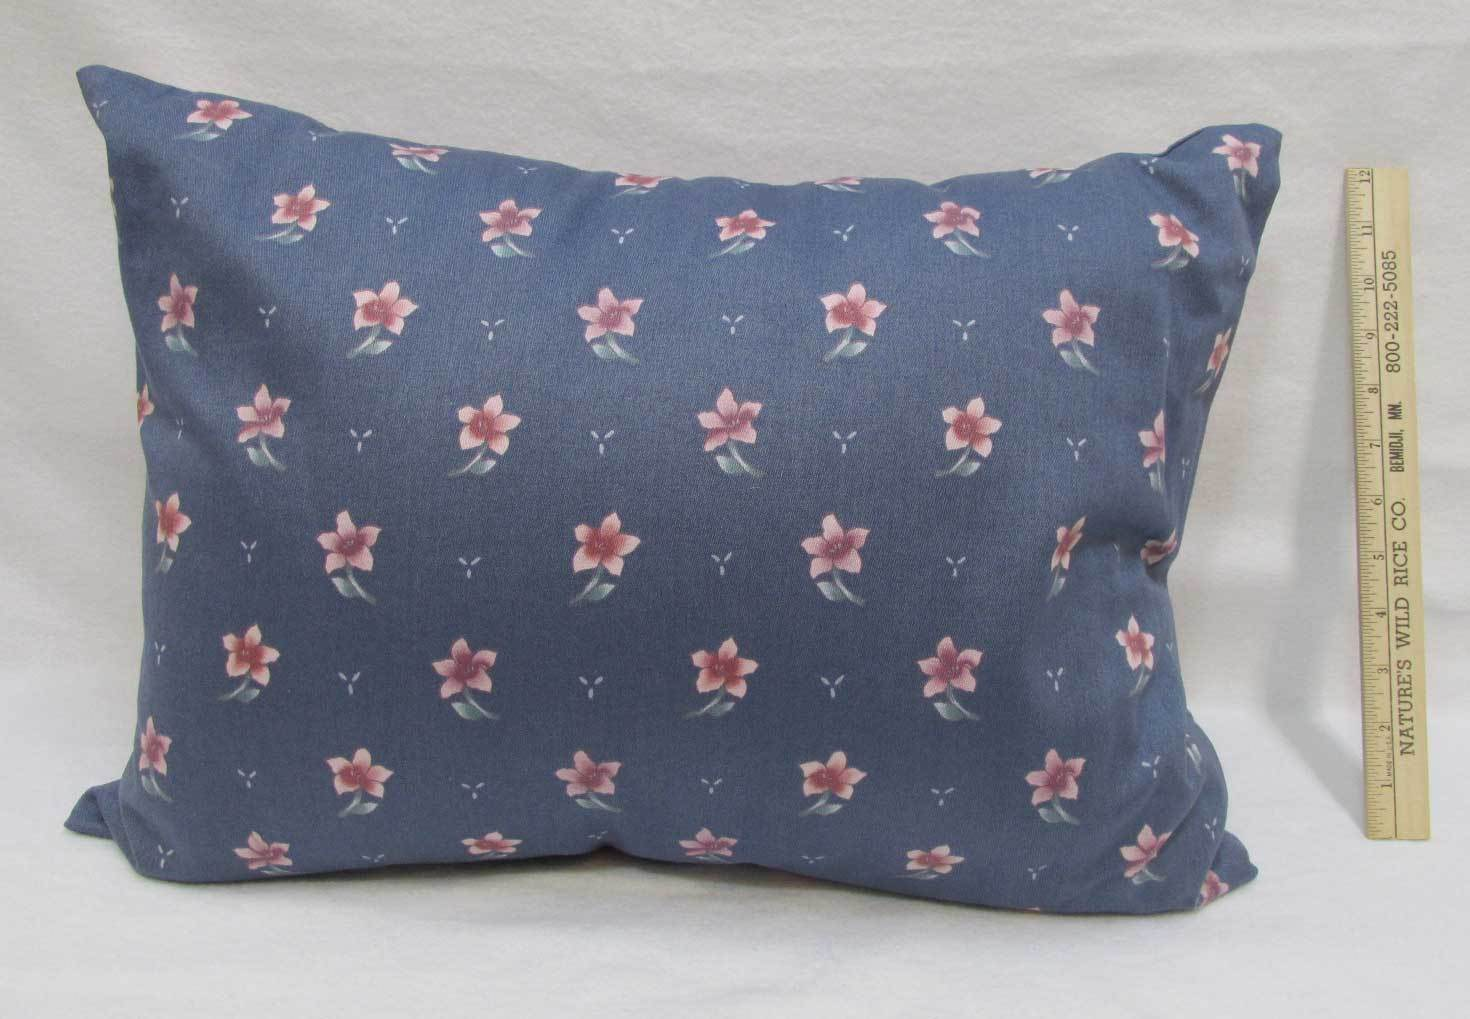 Quallofil Travel Pillow Car Camping Outdoors Blue Pink Floral Sham Down Alt